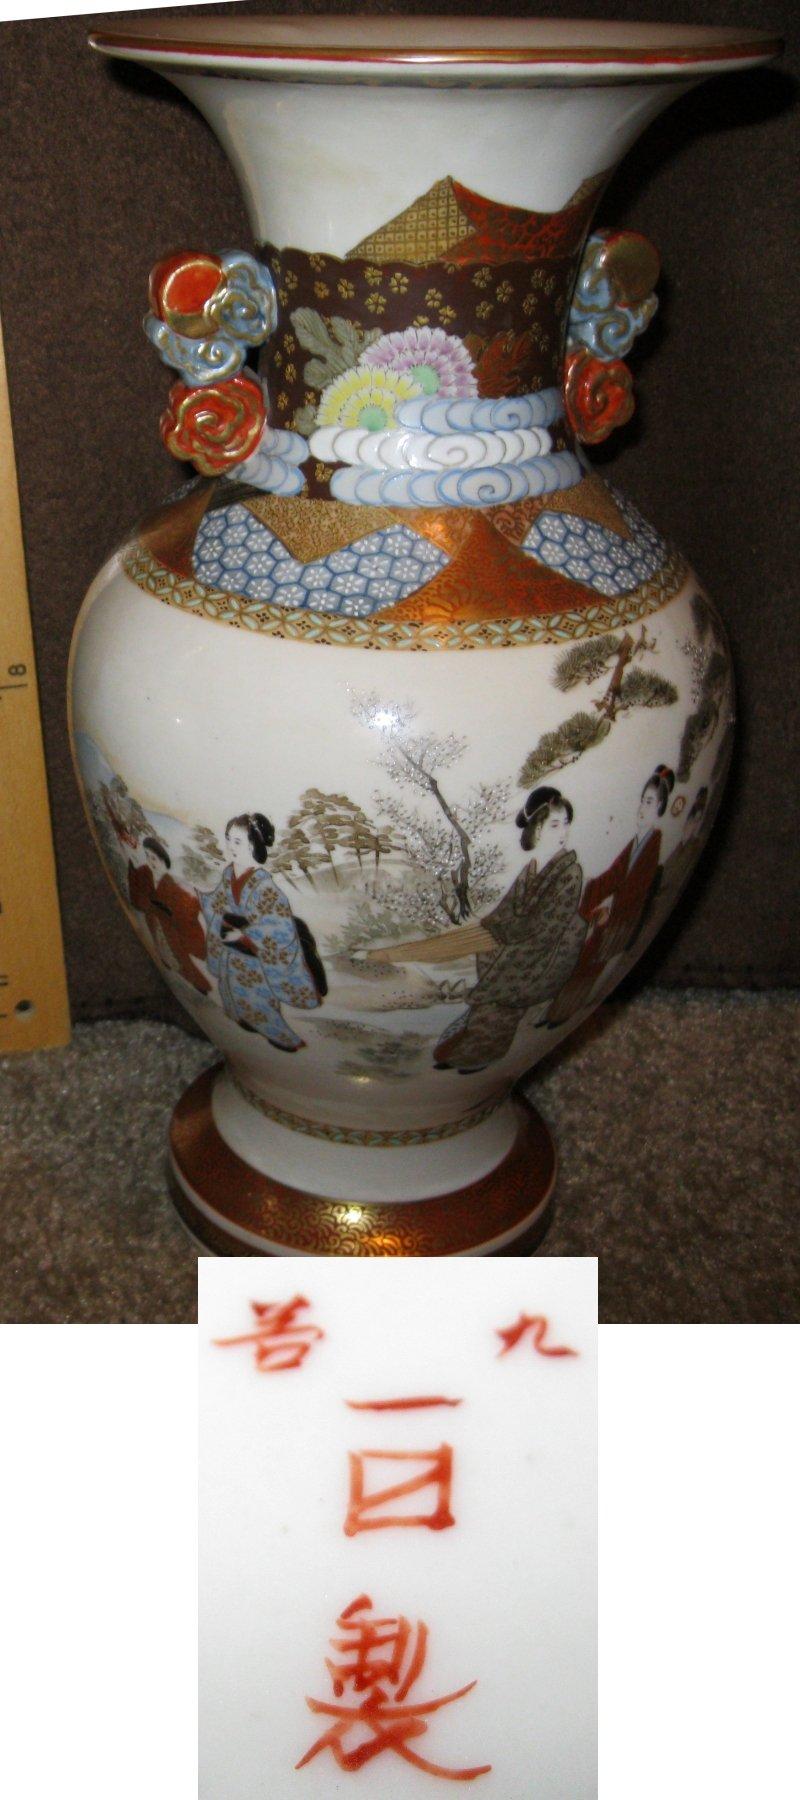 Kutani vase mark kutani ichinichi sei ichi hi sei one day made is probably a workshop probably meiji period 1868 1912 or slightly later reviewsmspy